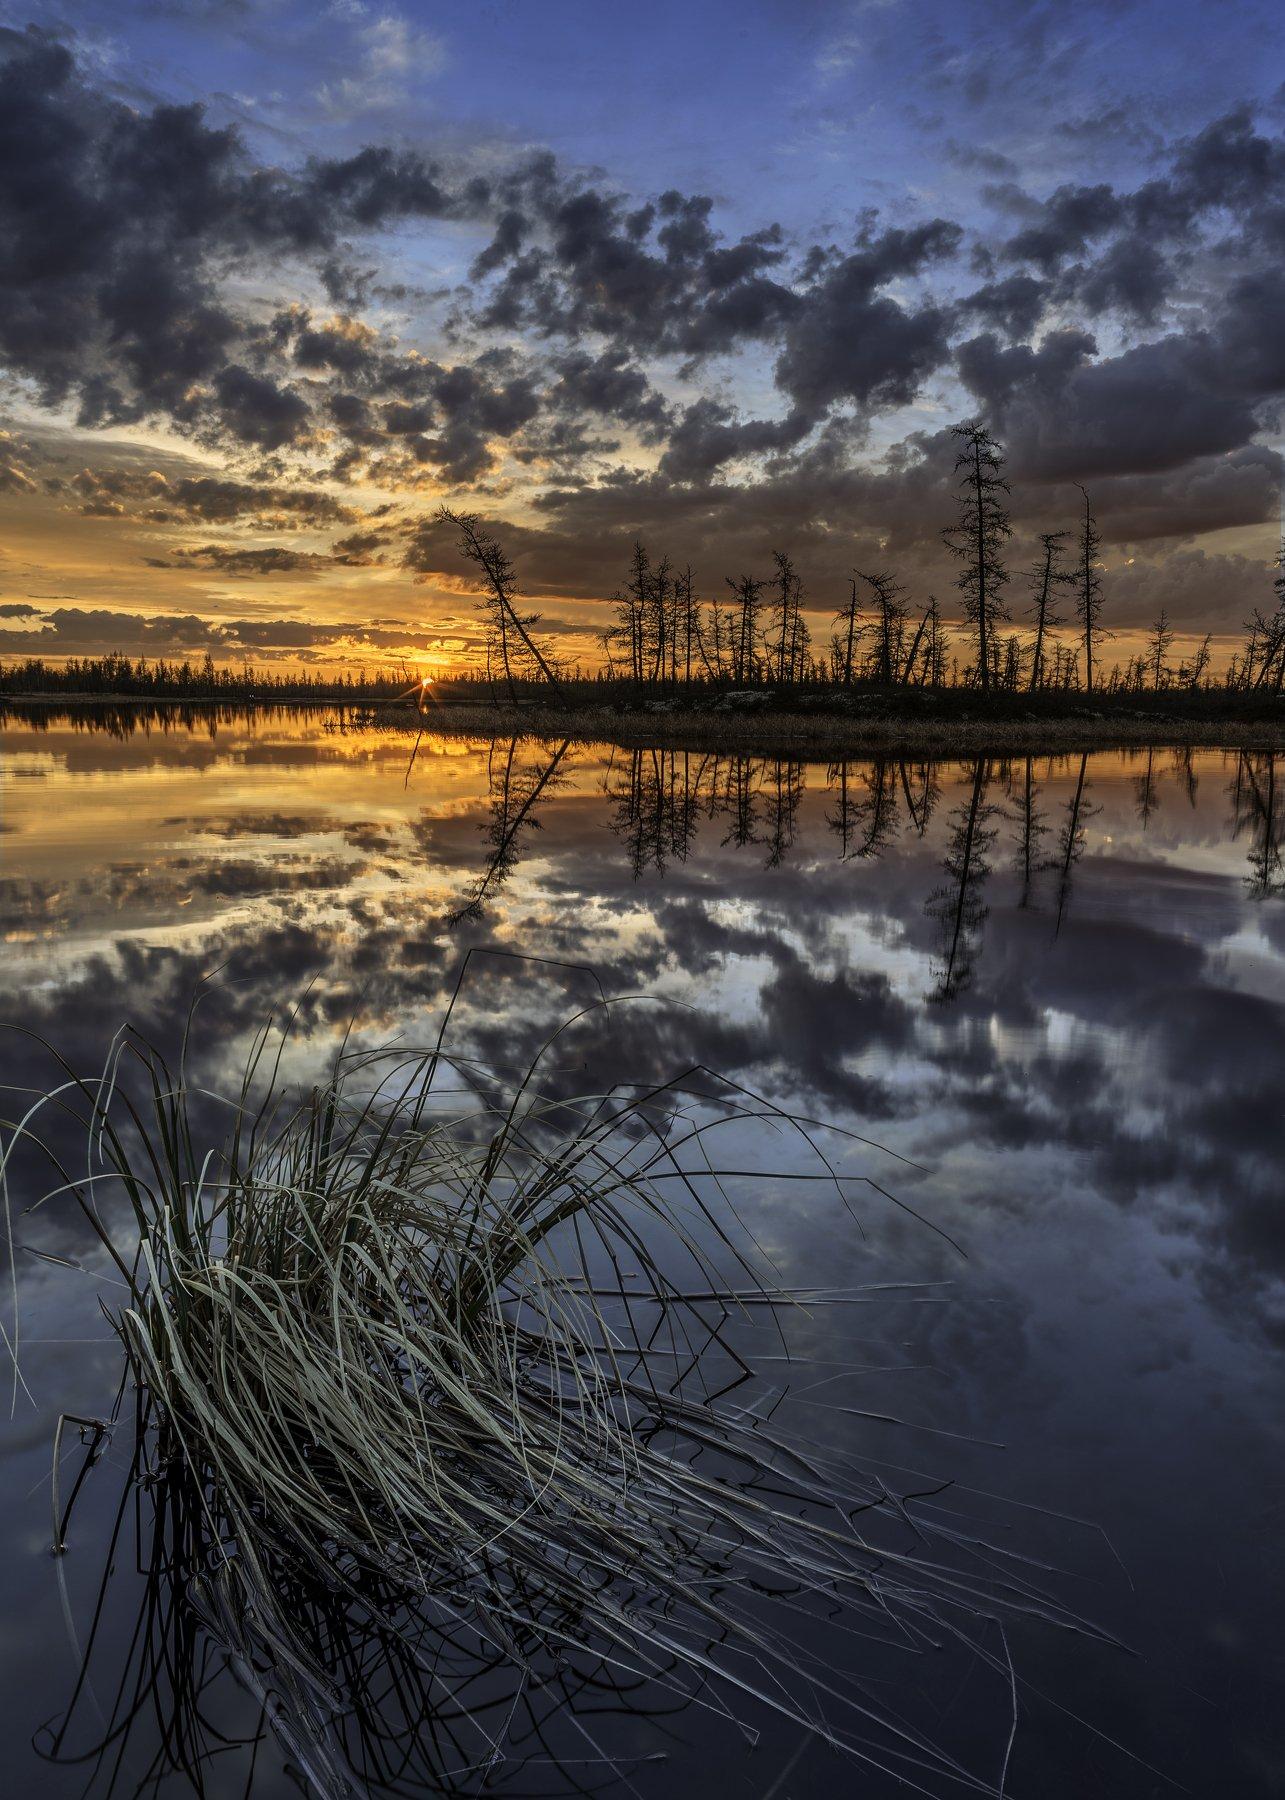 ямал, тундра, пейзаж, болото, россия, canon, закат, ночь, уренгой, новыйуренгой, Камиль Нуреев